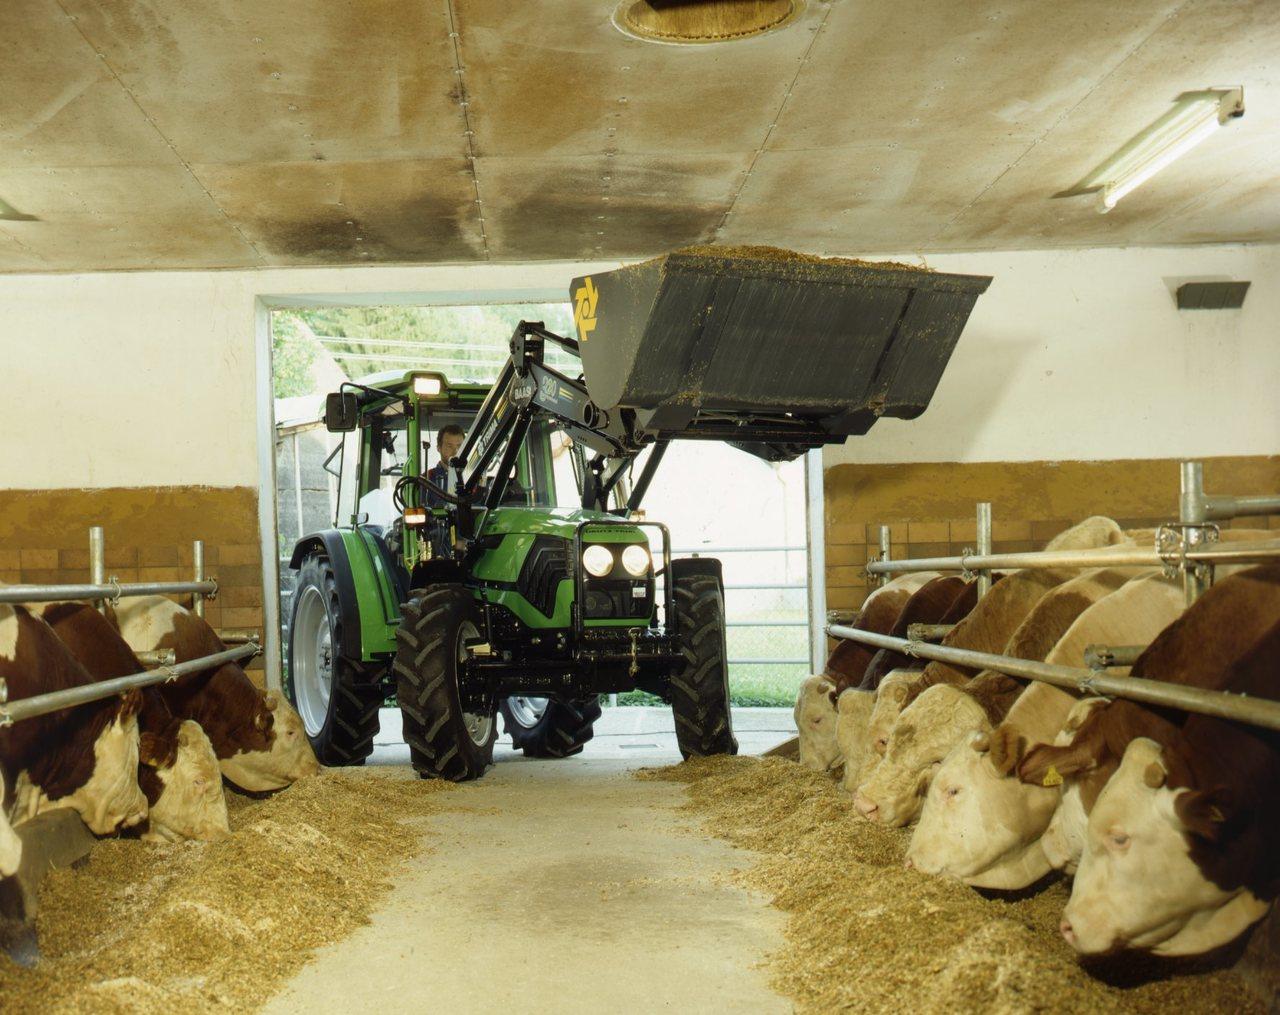 [Deutz-Fahr] trattore Agroplus 70 durante lavoro in azienda